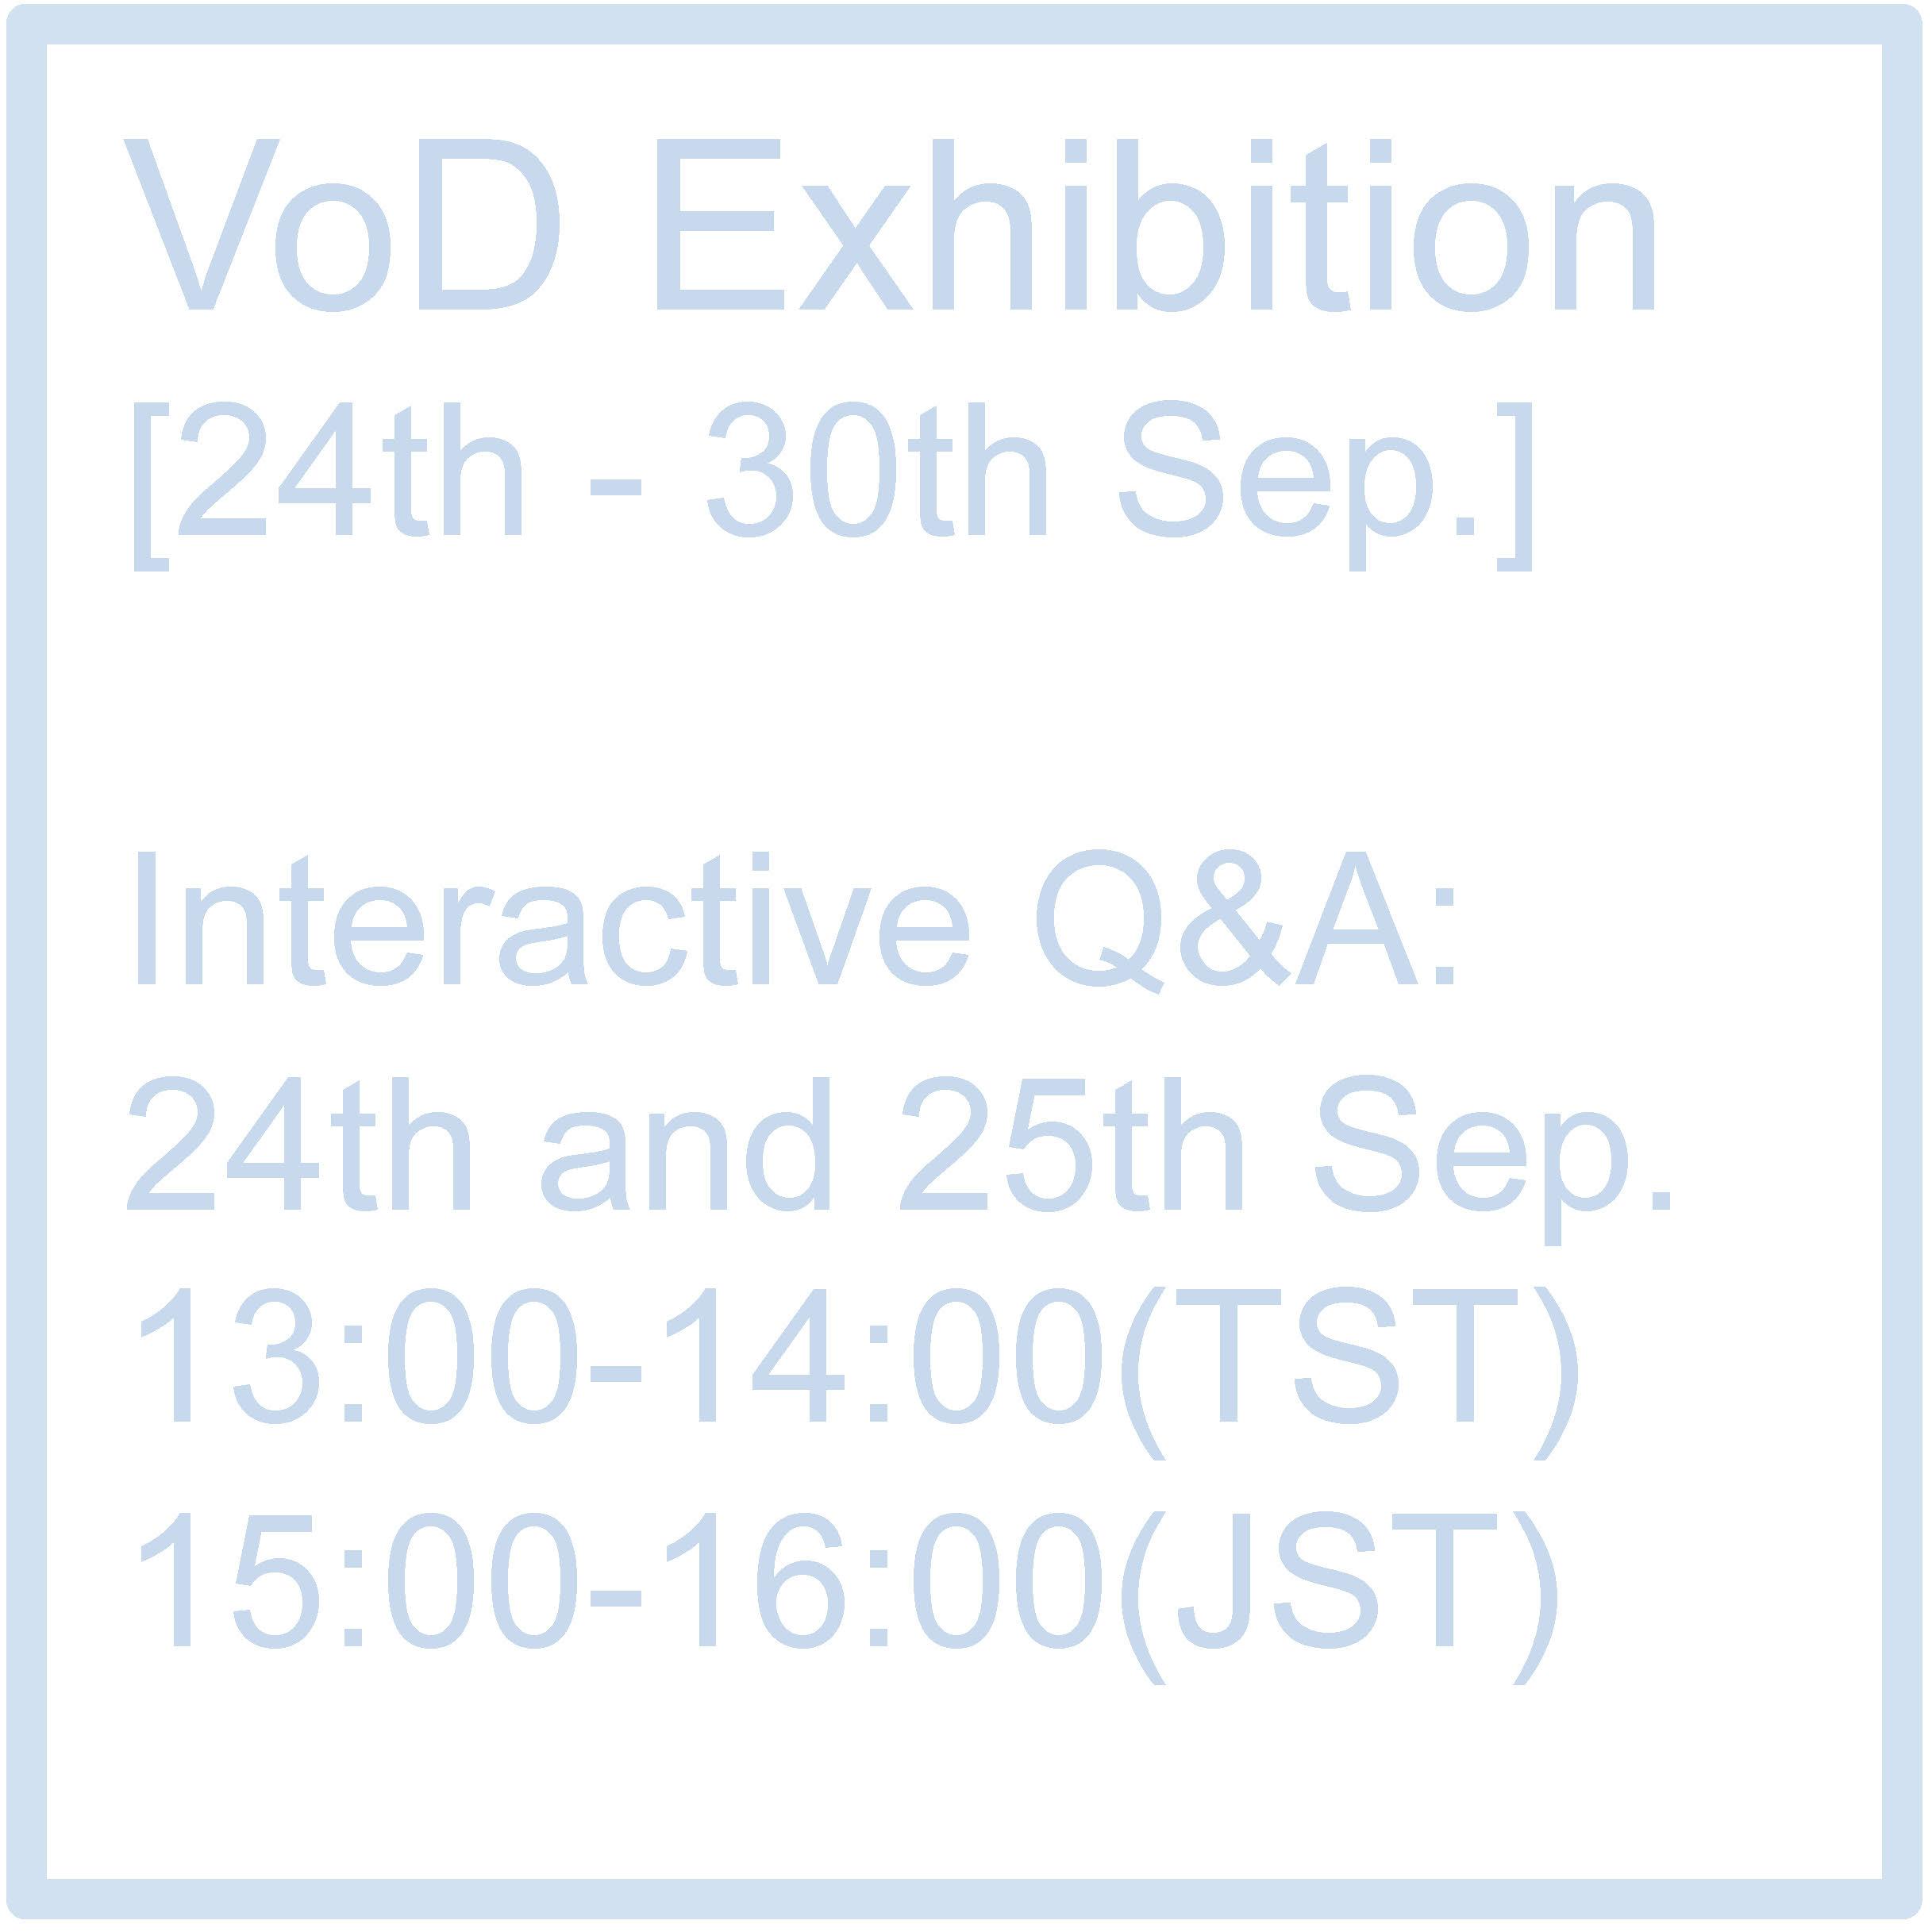 VoD Exhibition